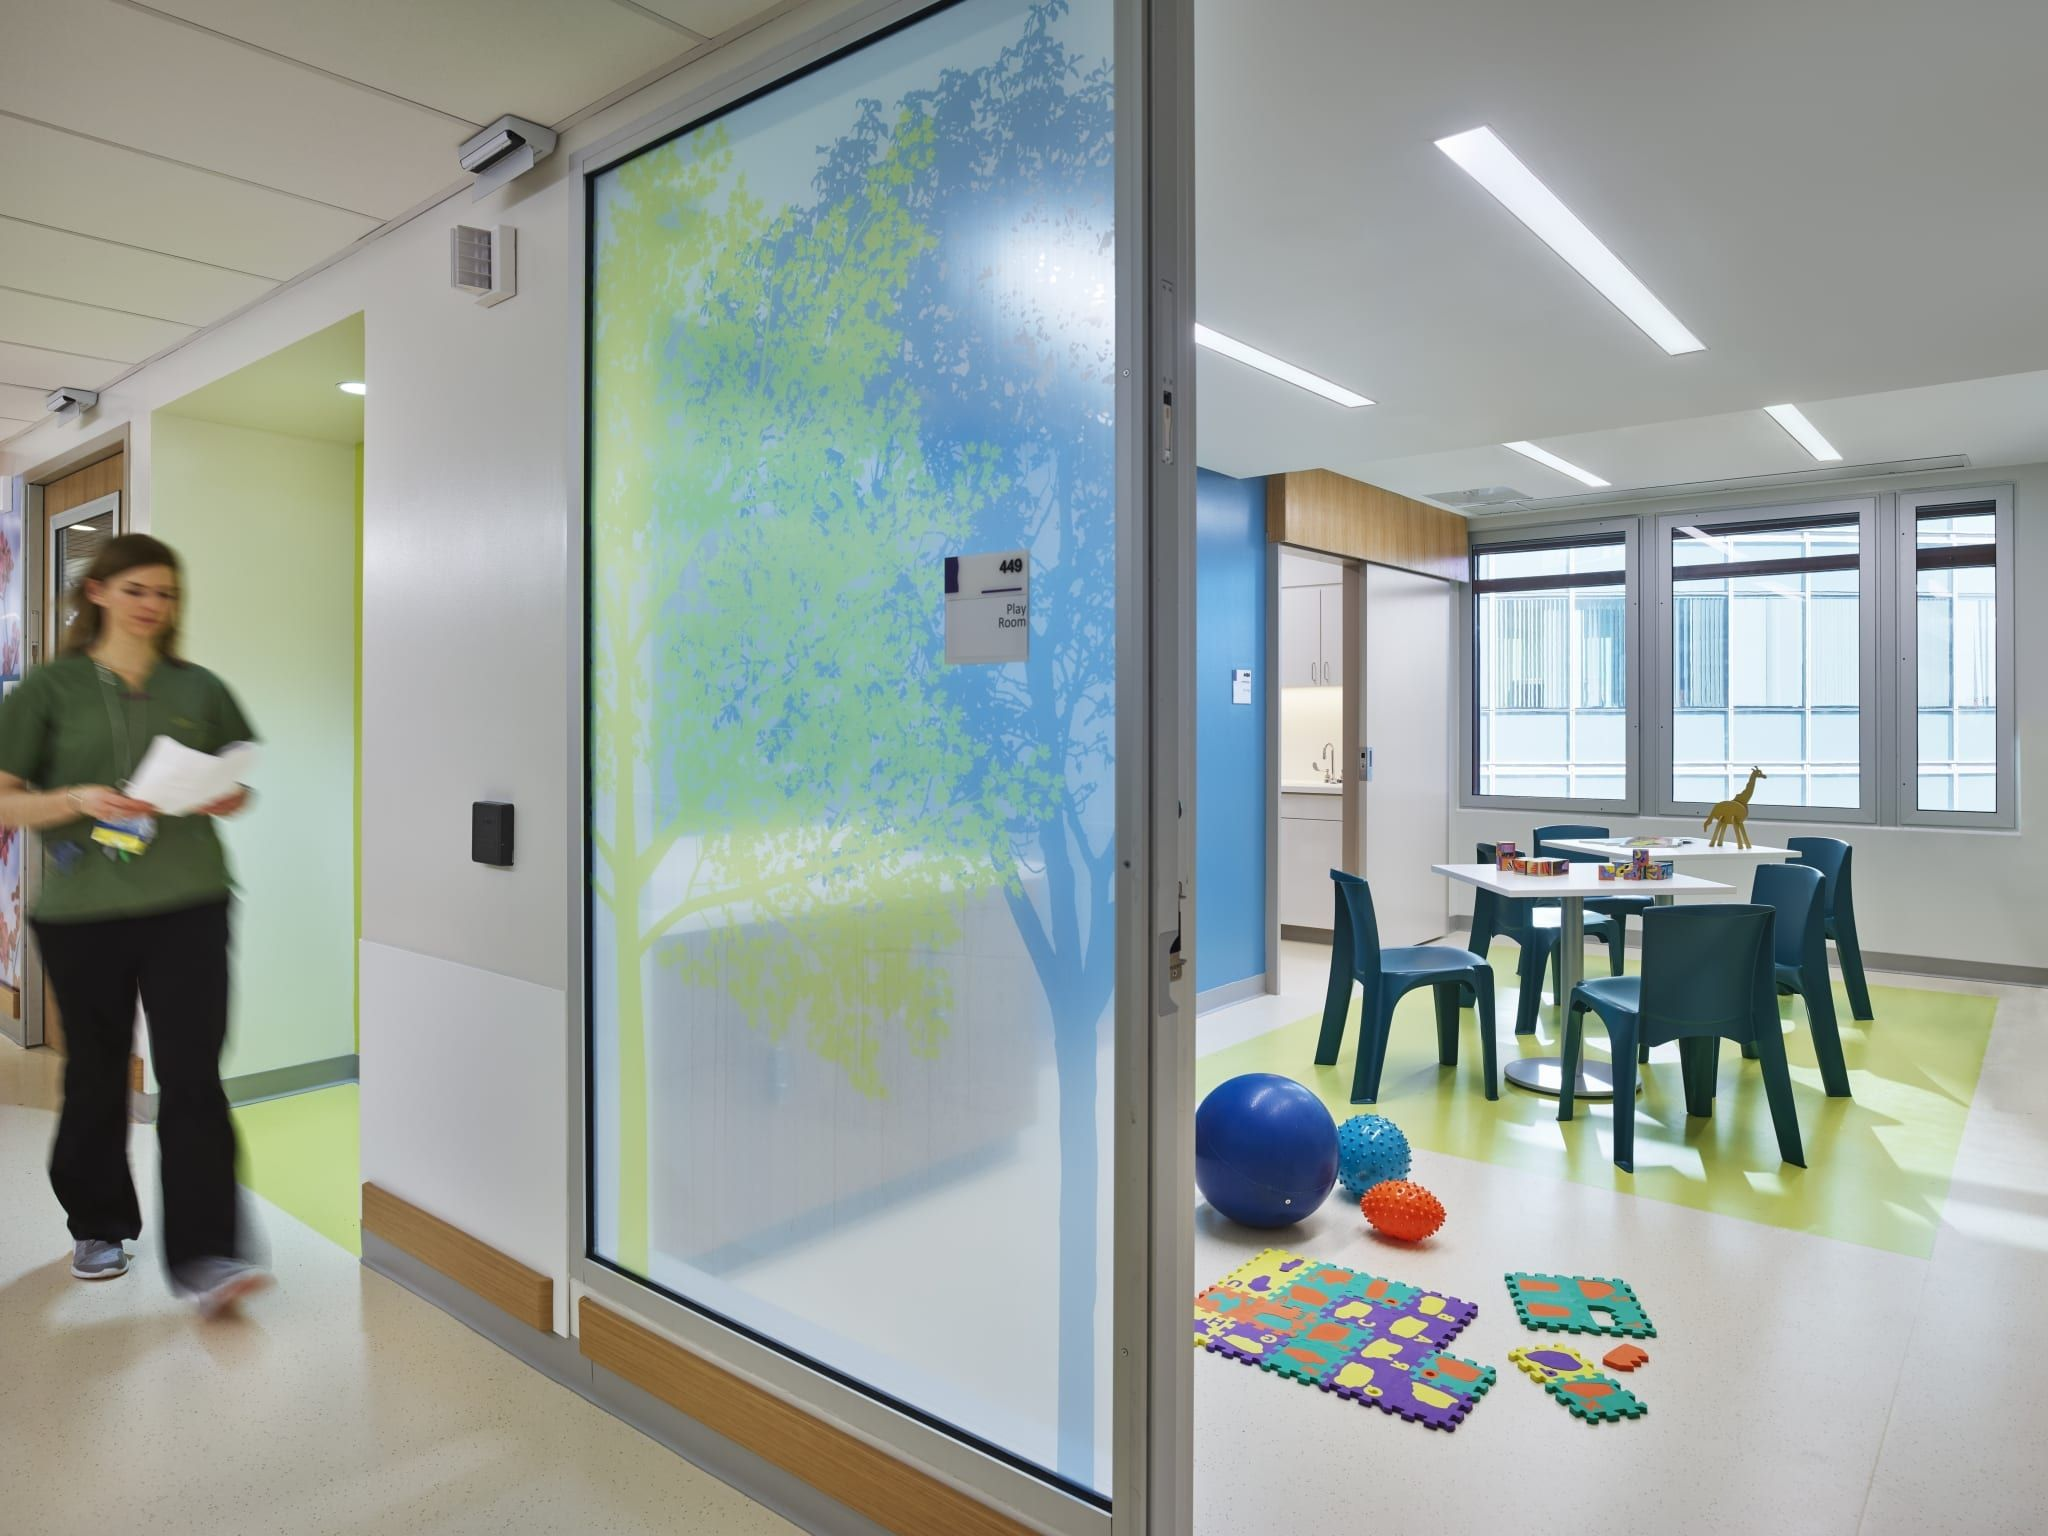 Childrens hospital of philadelphia medical behavioral